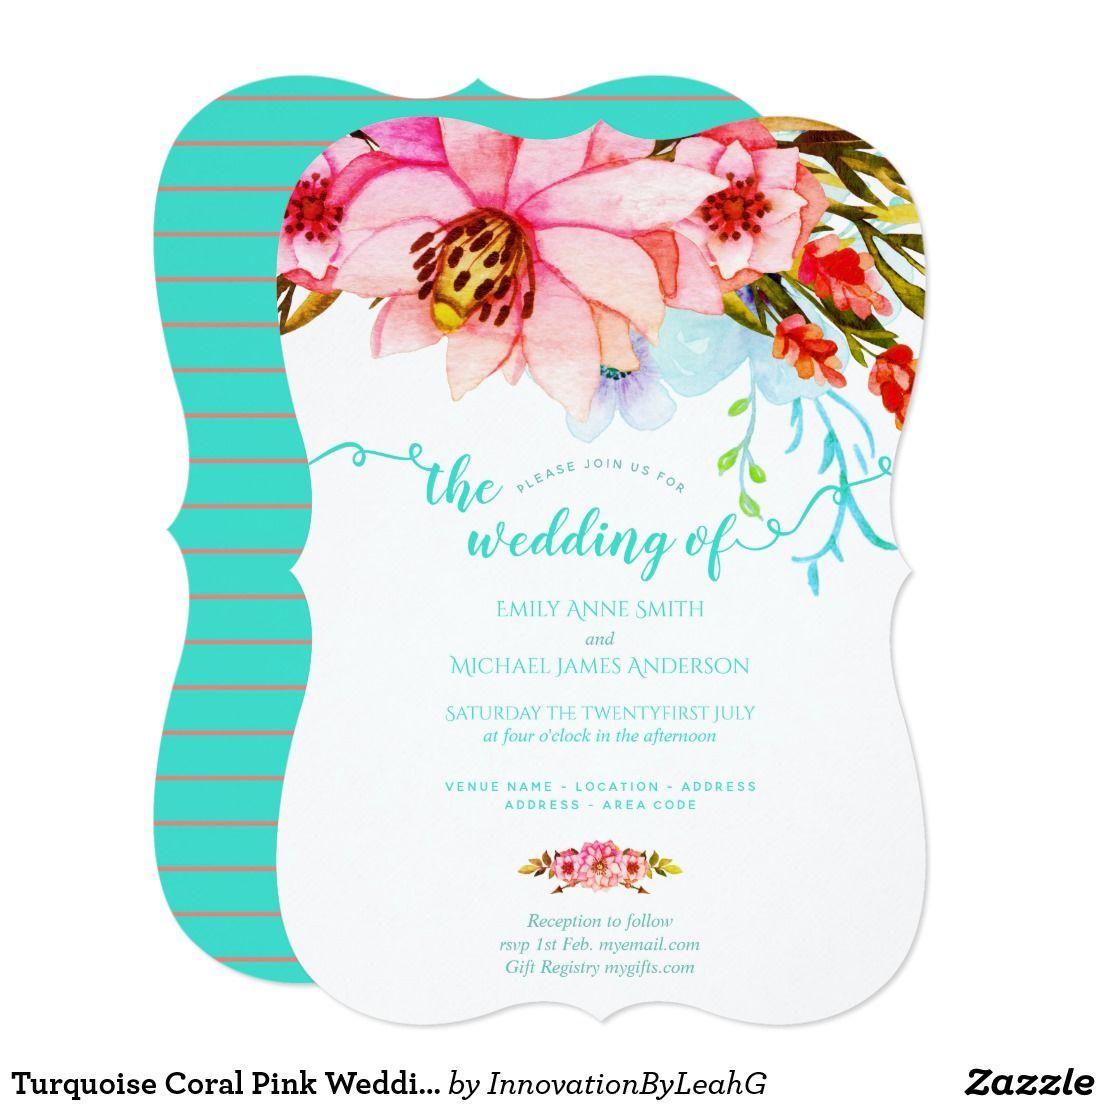 Turquoise Coral Pink Wedding Invitations Flowers | Zazzle.com #turquoisecoralweddings